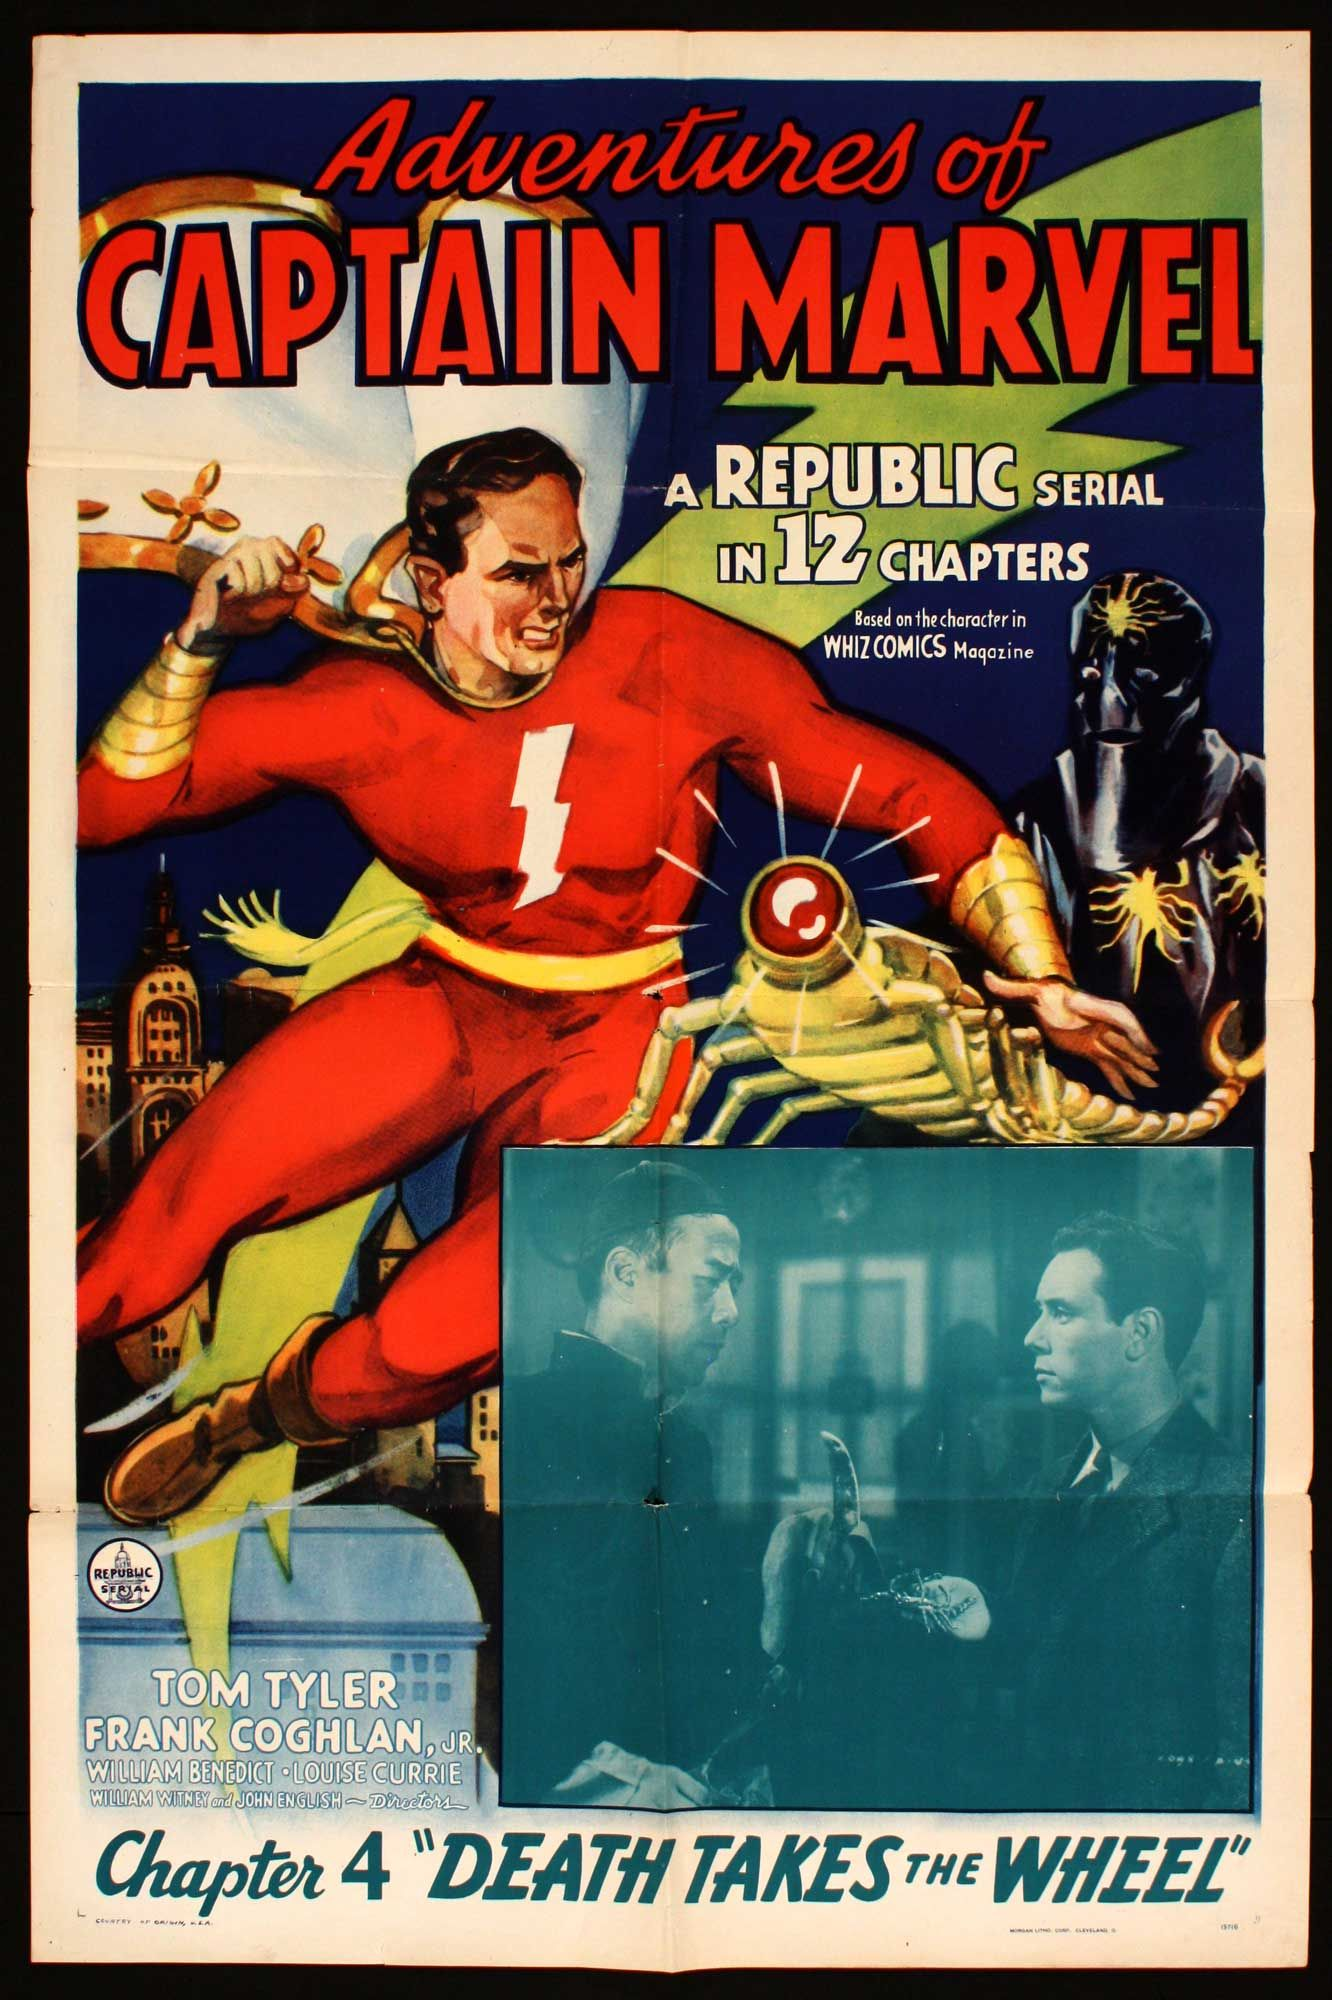 The Adventures Of Captain Marvel Republic Pictures